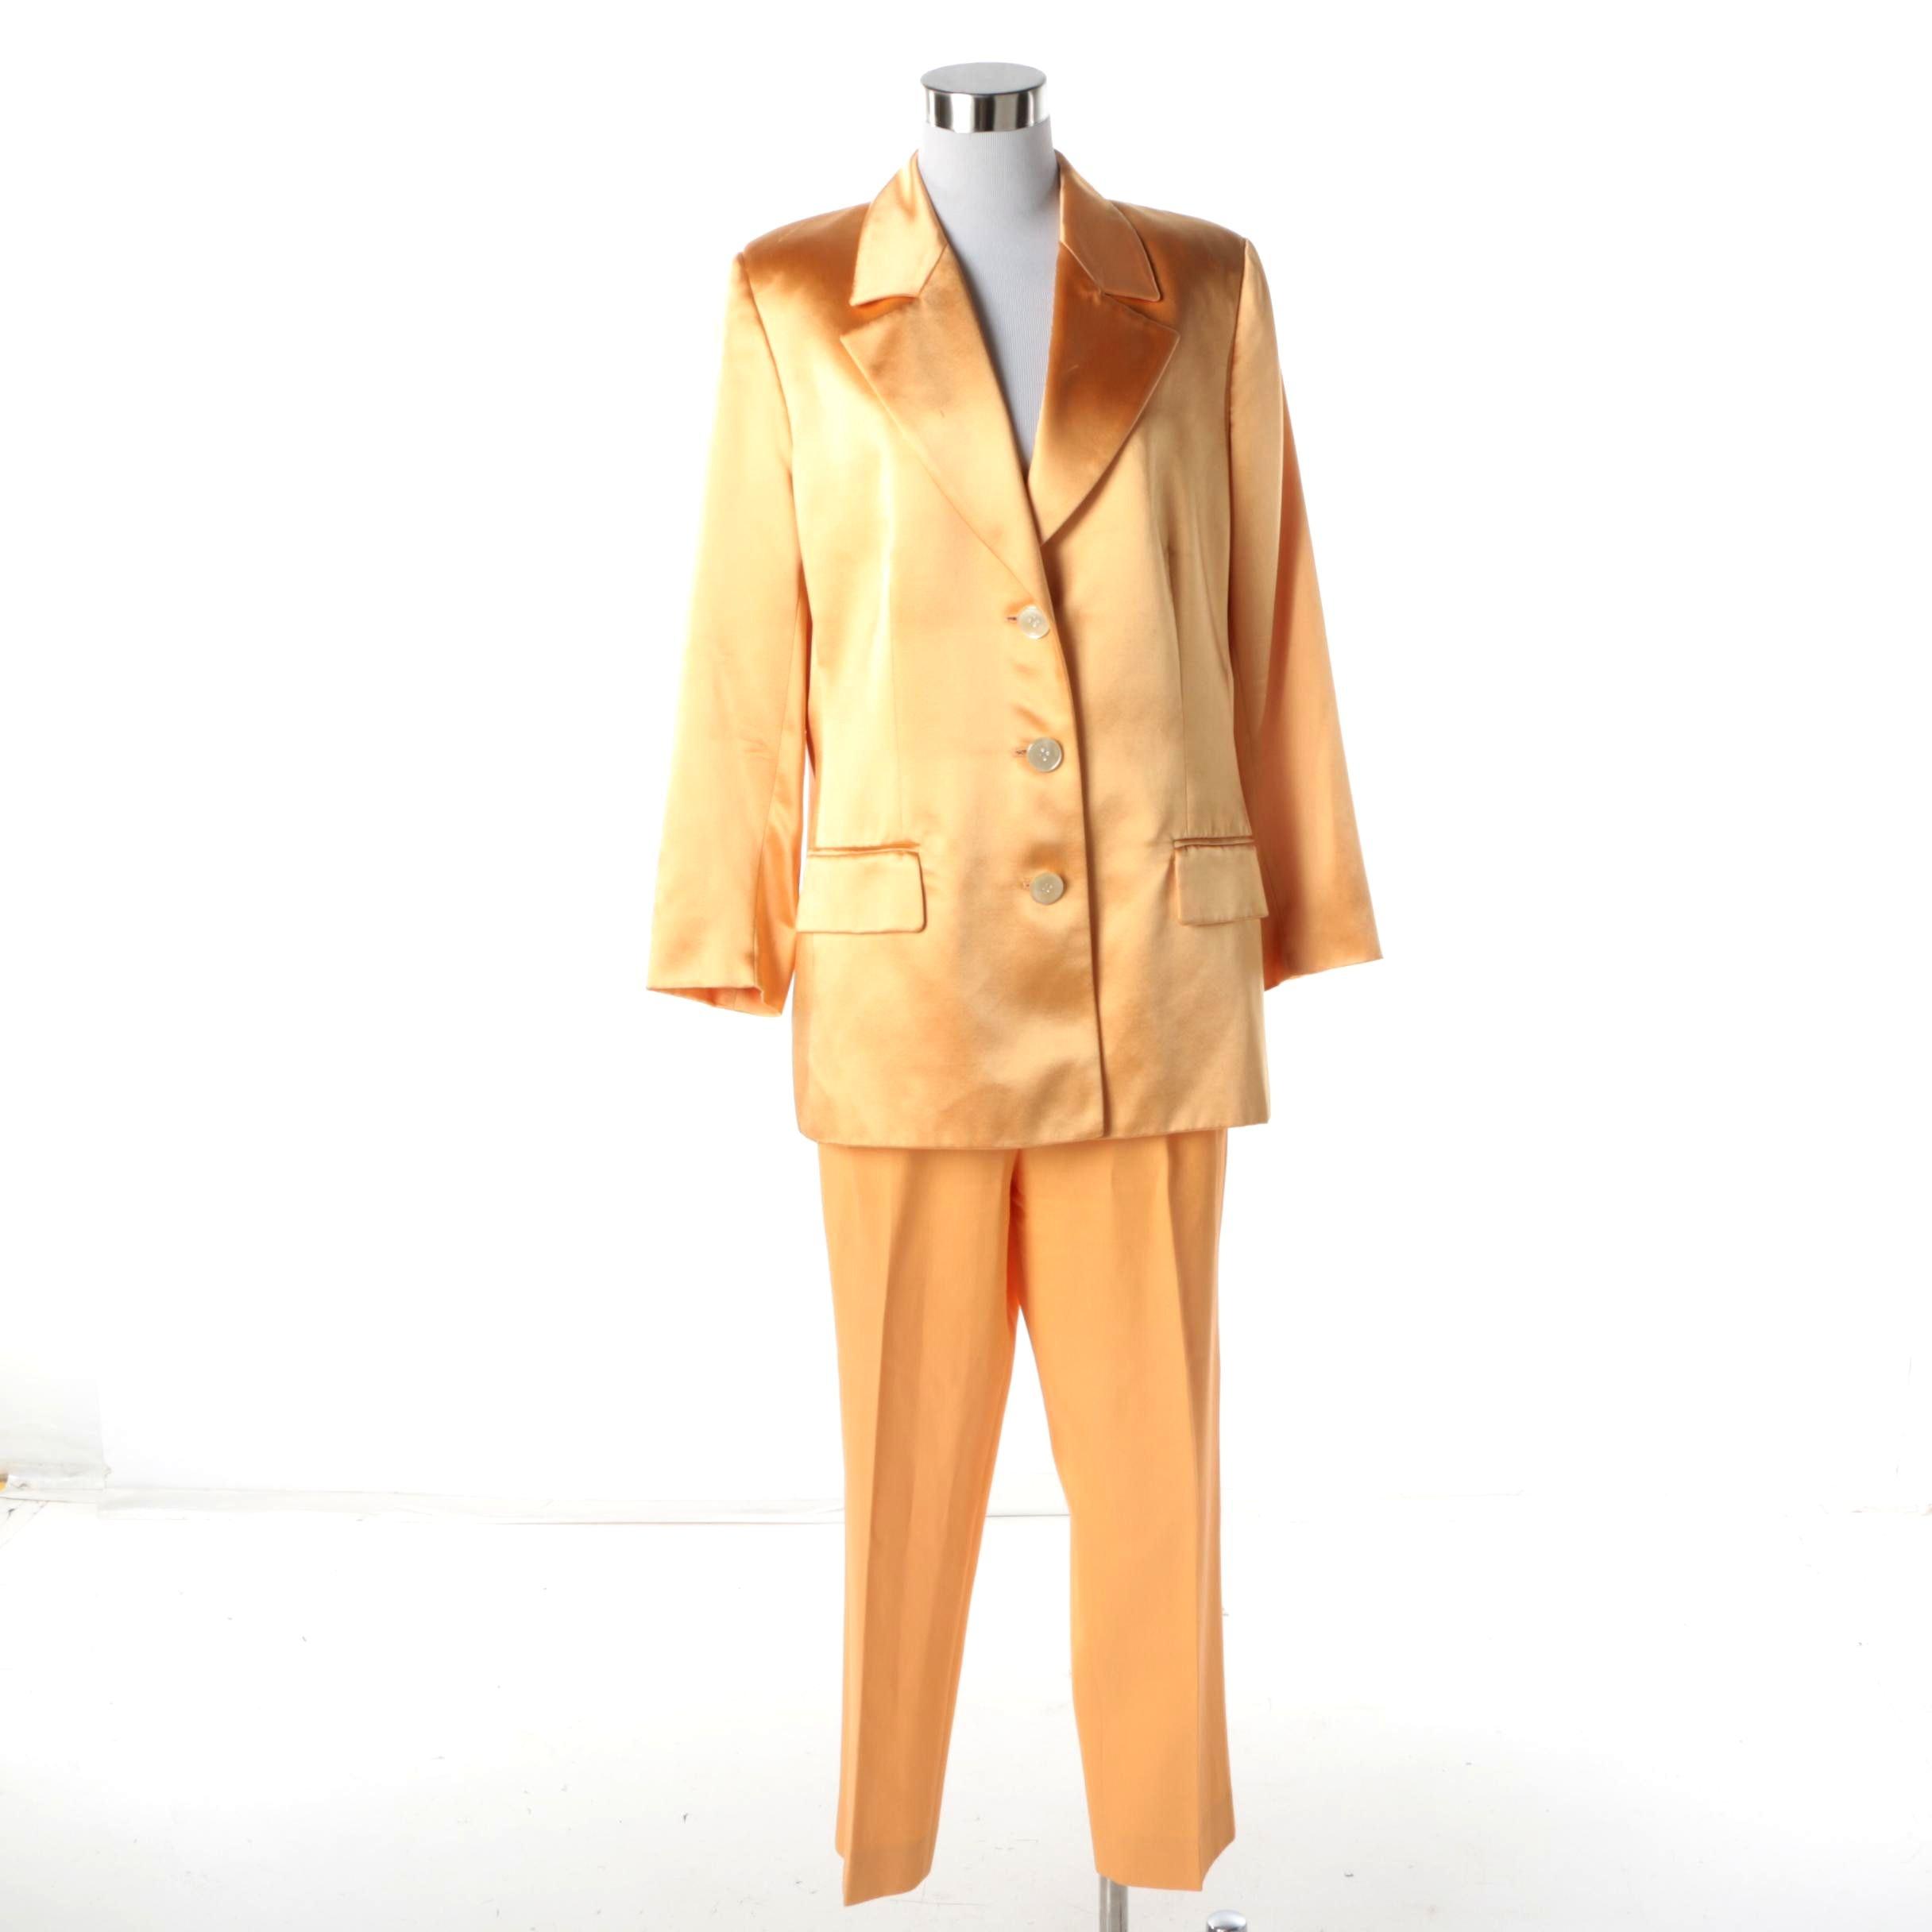 Women's Valentino Pale Orange Jacket and Pants